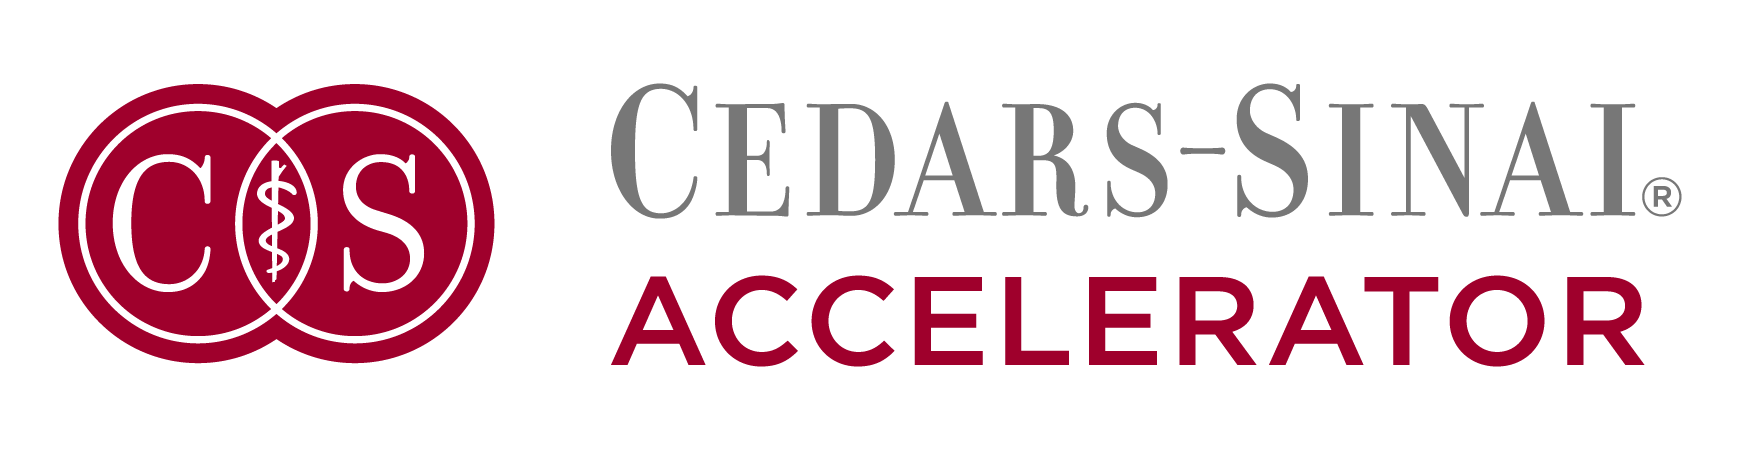 3418_Cedars-Sinai_ACC_Logo_RGB[1].png